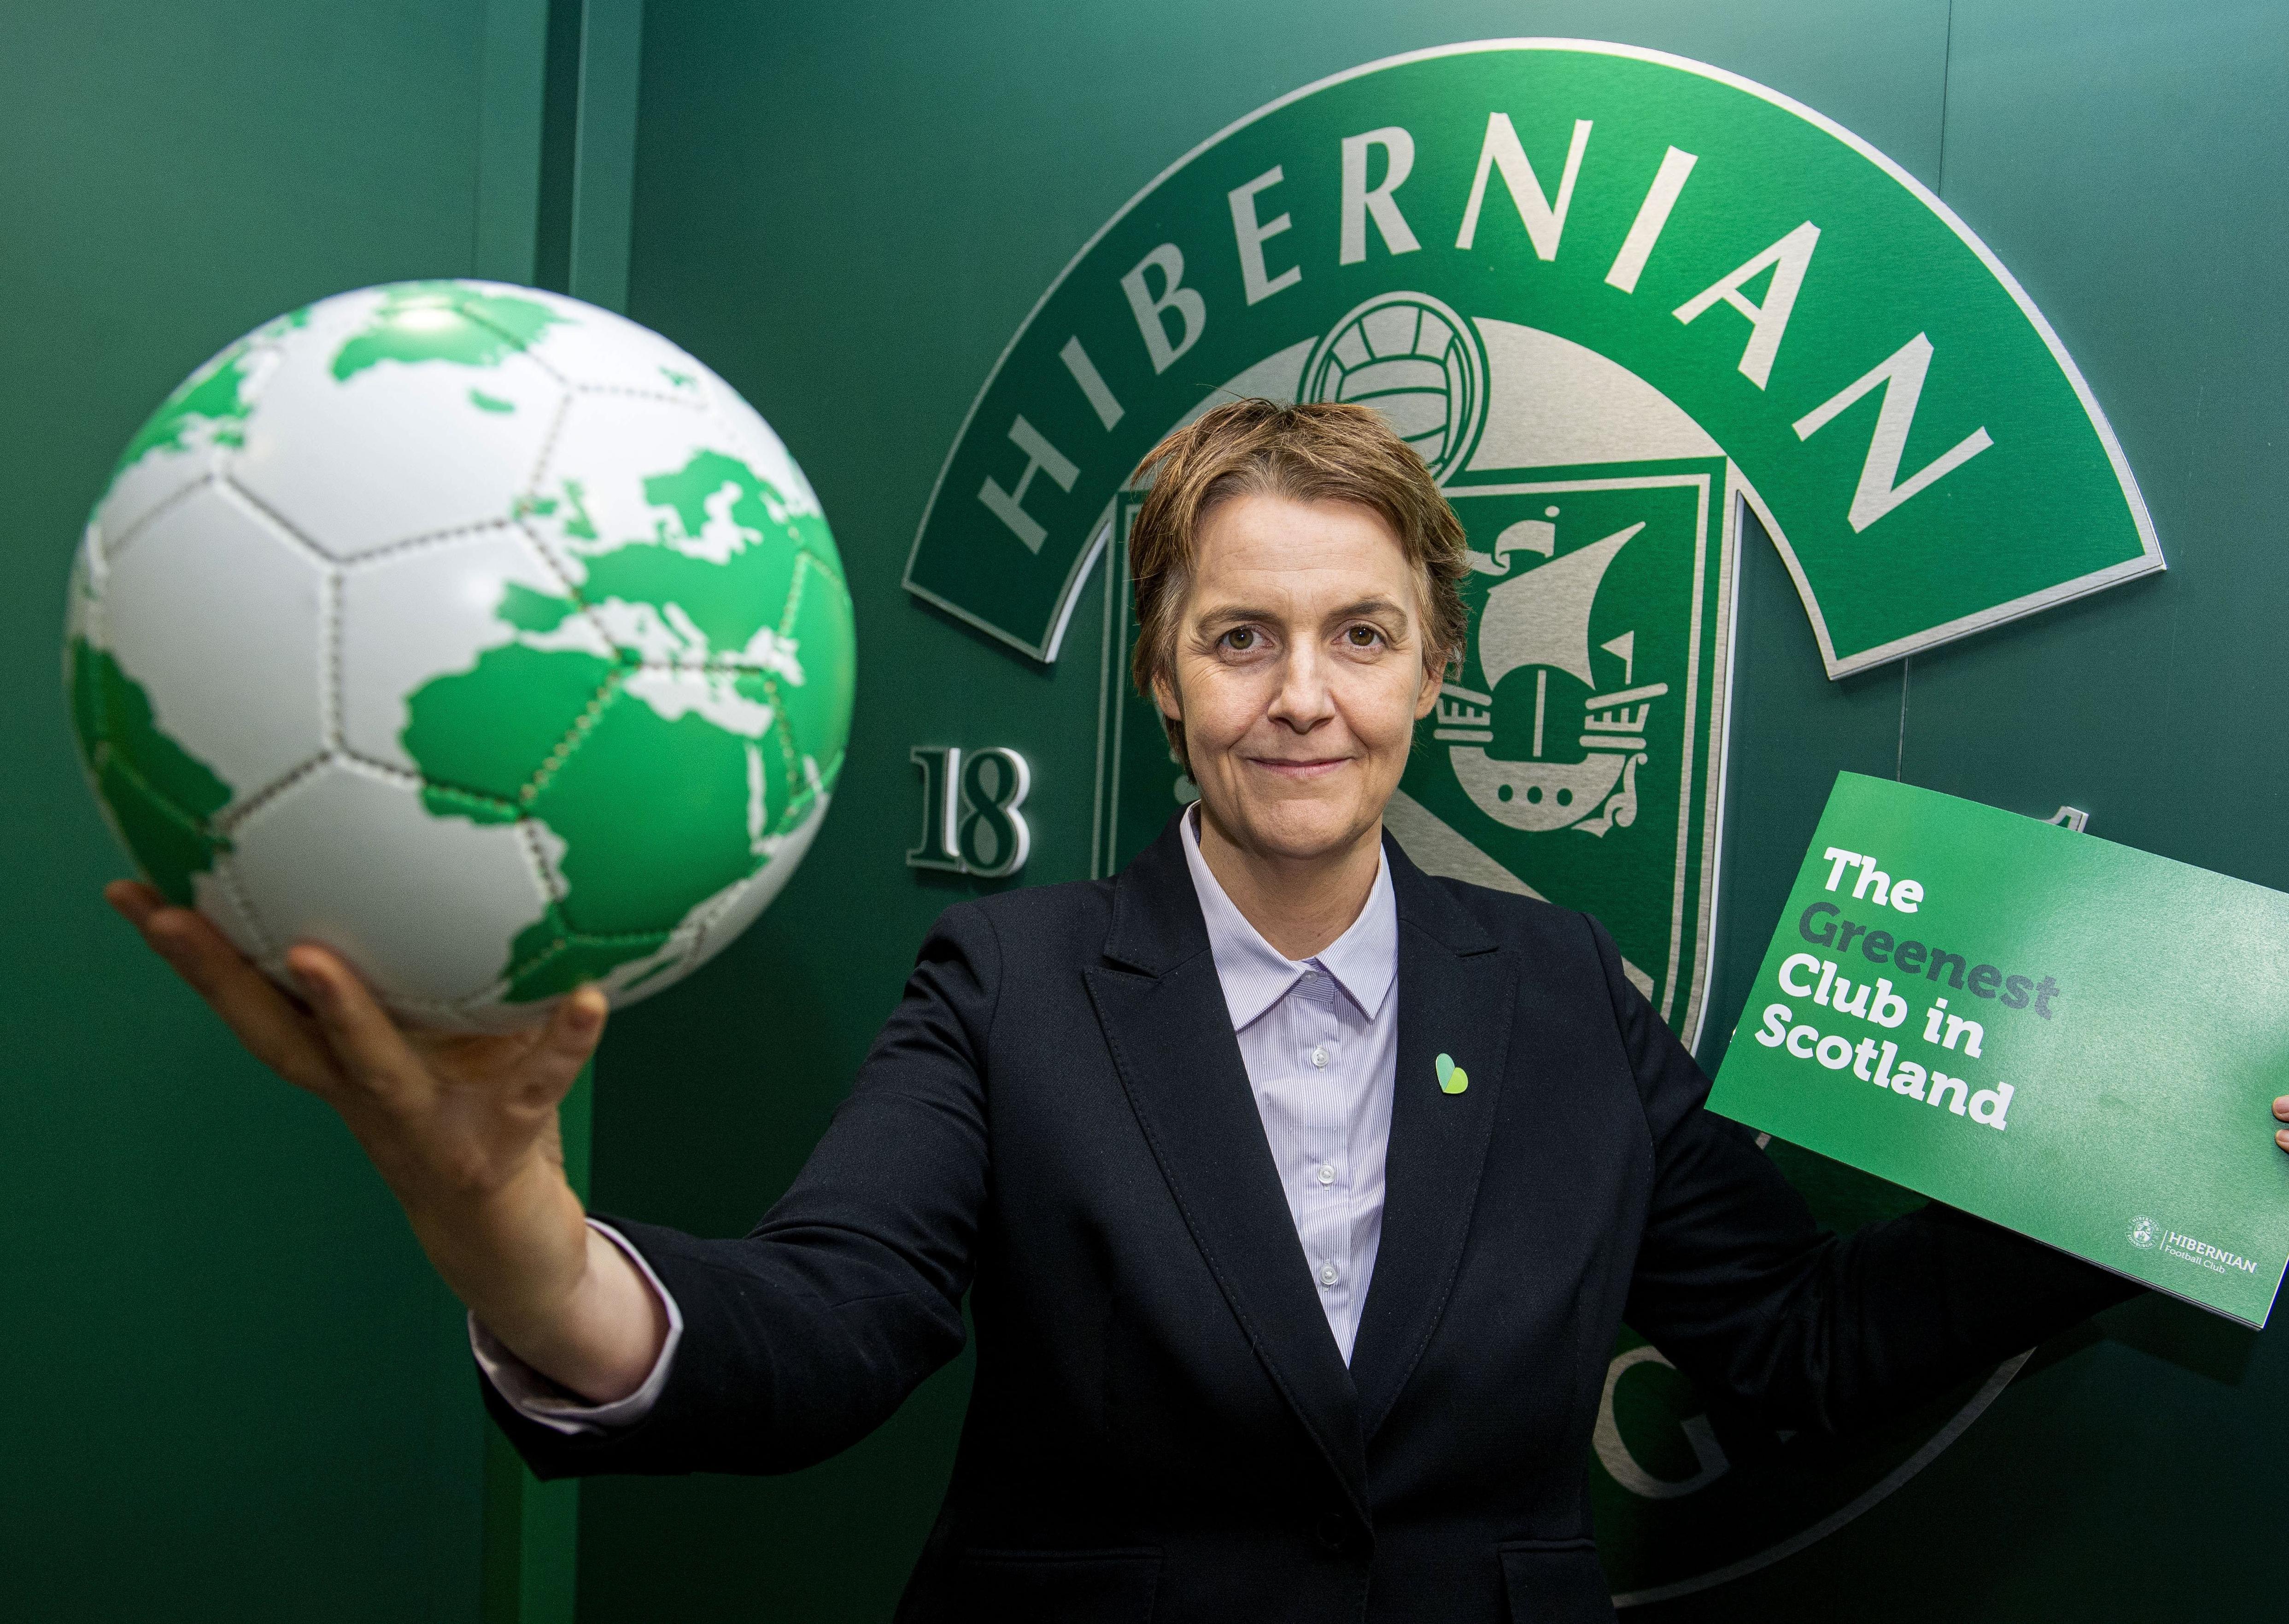 www.edinburghnews.scotsman.com